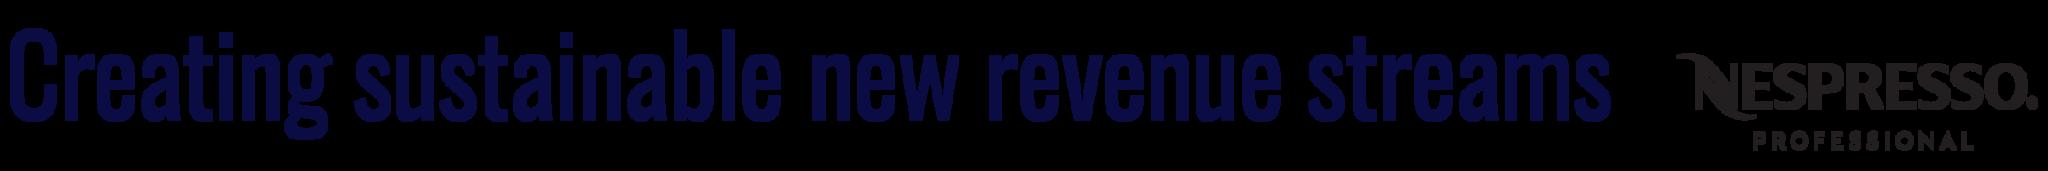 Innovation Webinar Strap Line